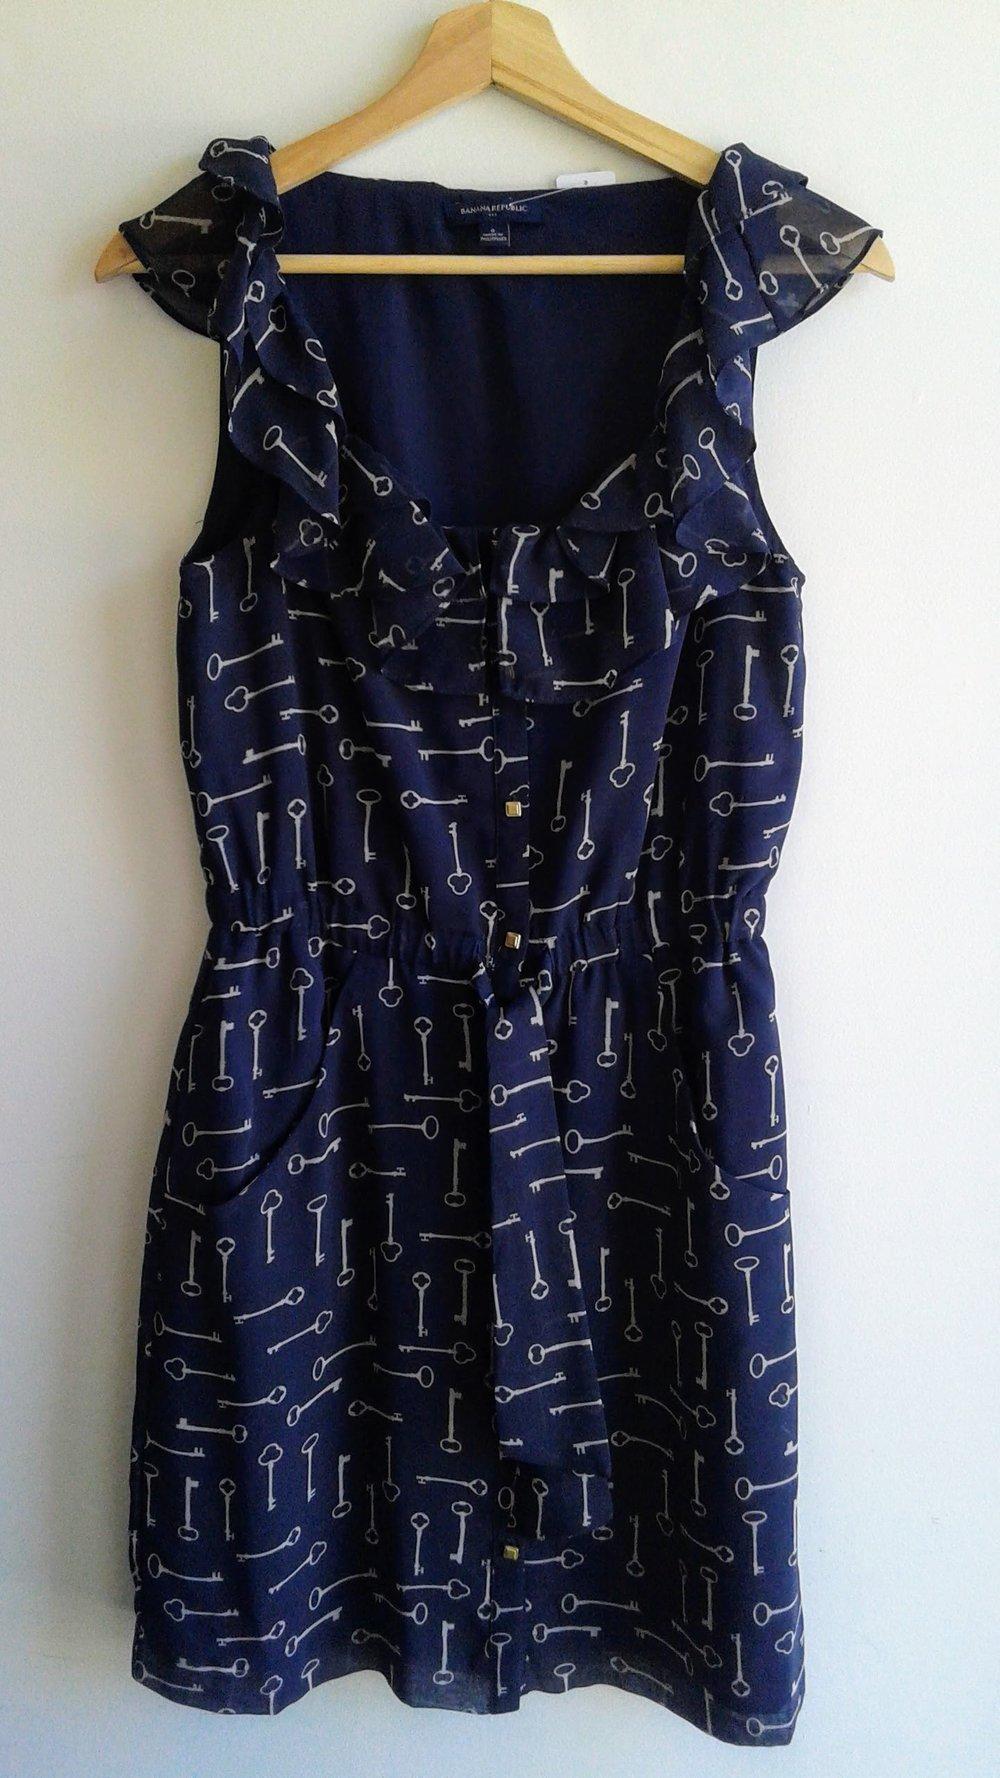 Banana Republic dress; Size S, $30